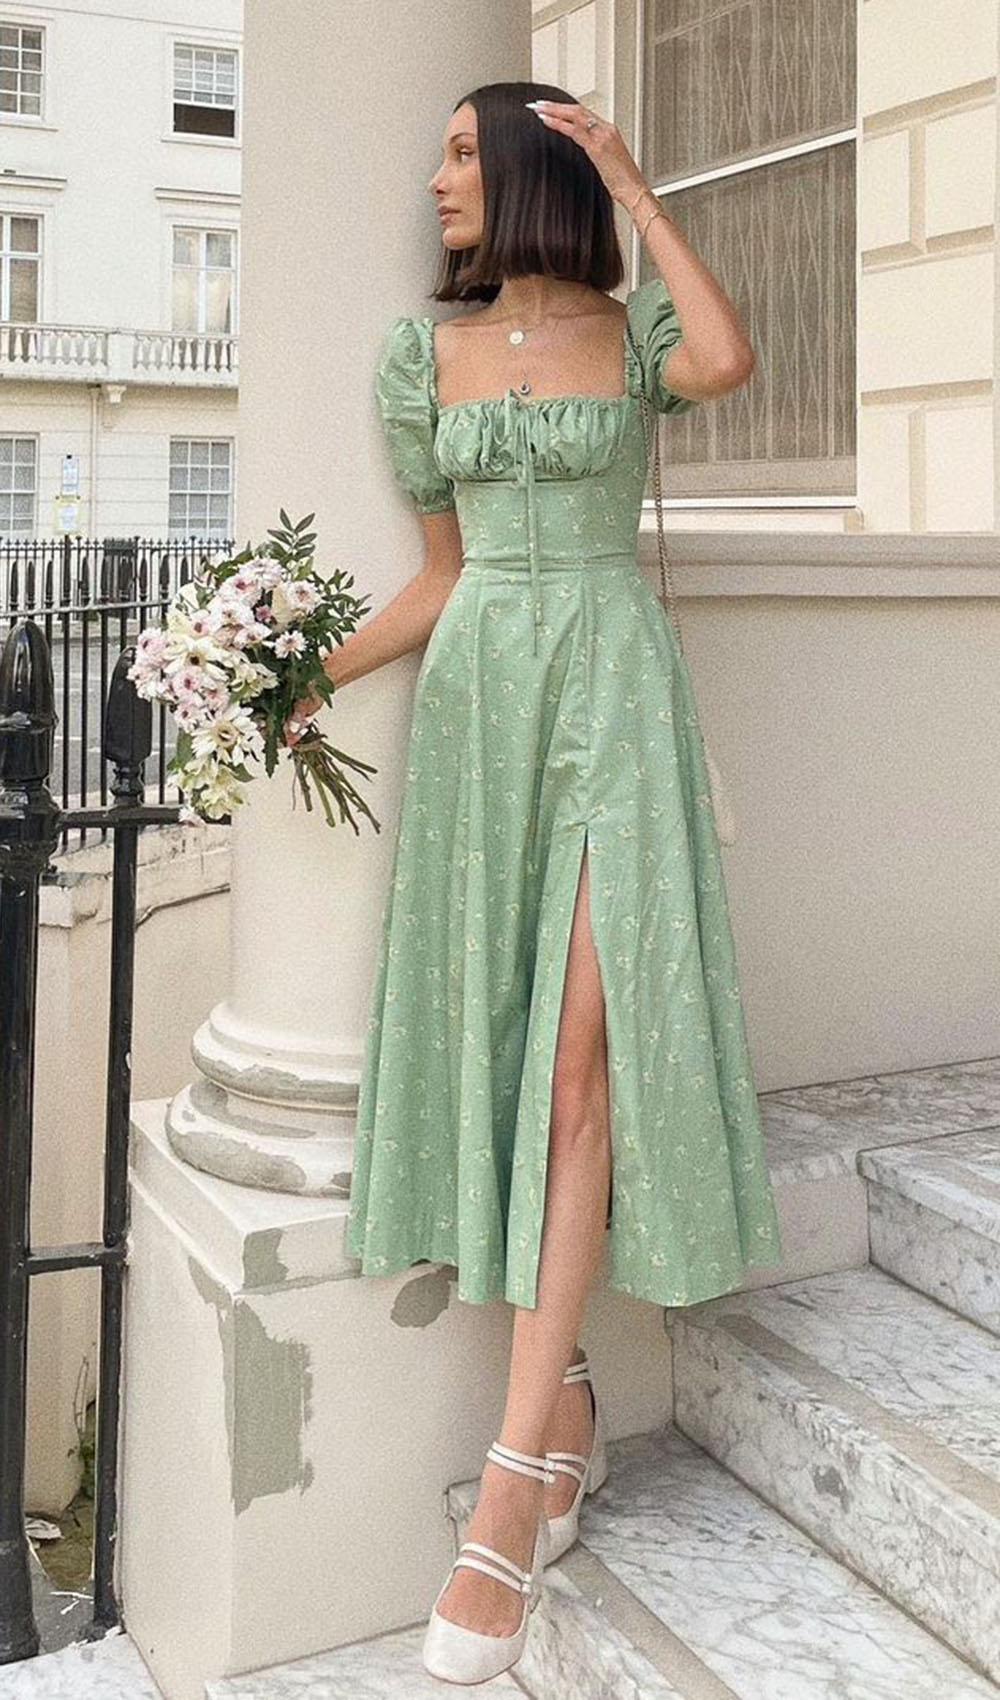 cottagecore, vestido verde flroal e sapato fechado